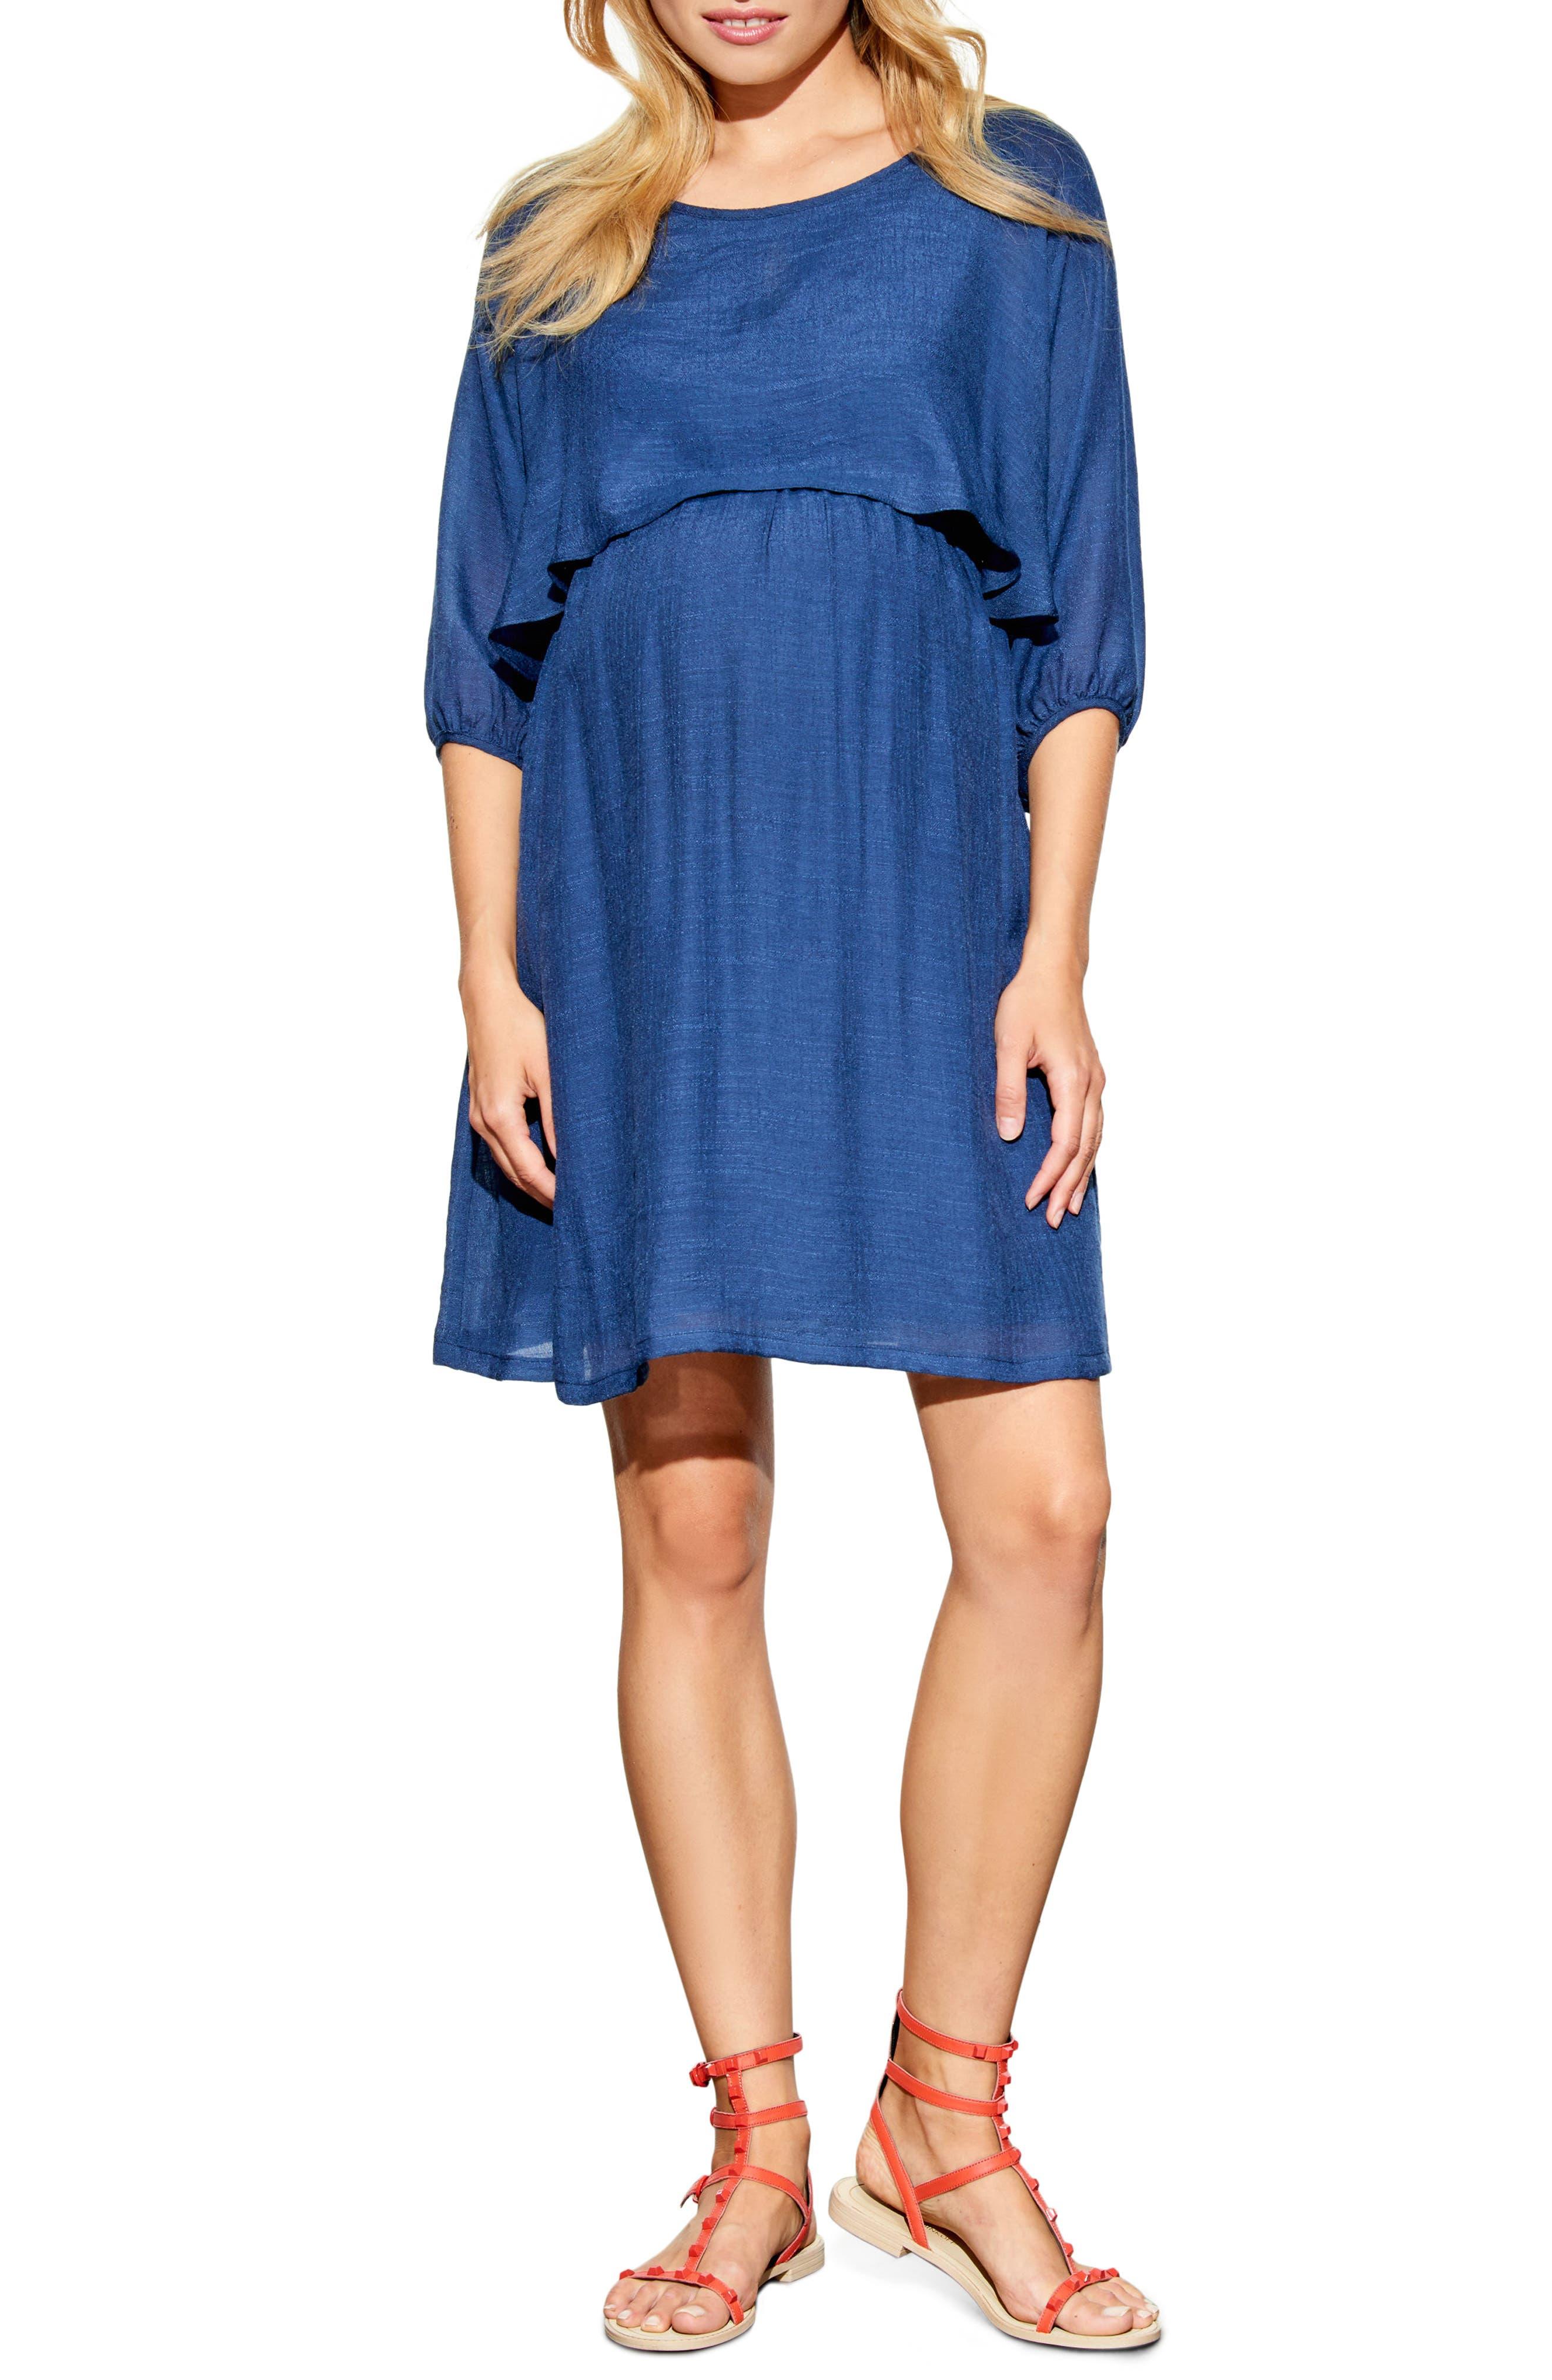 Maternal America Ruffle Overlay Maternity/nursing Dress, Blue